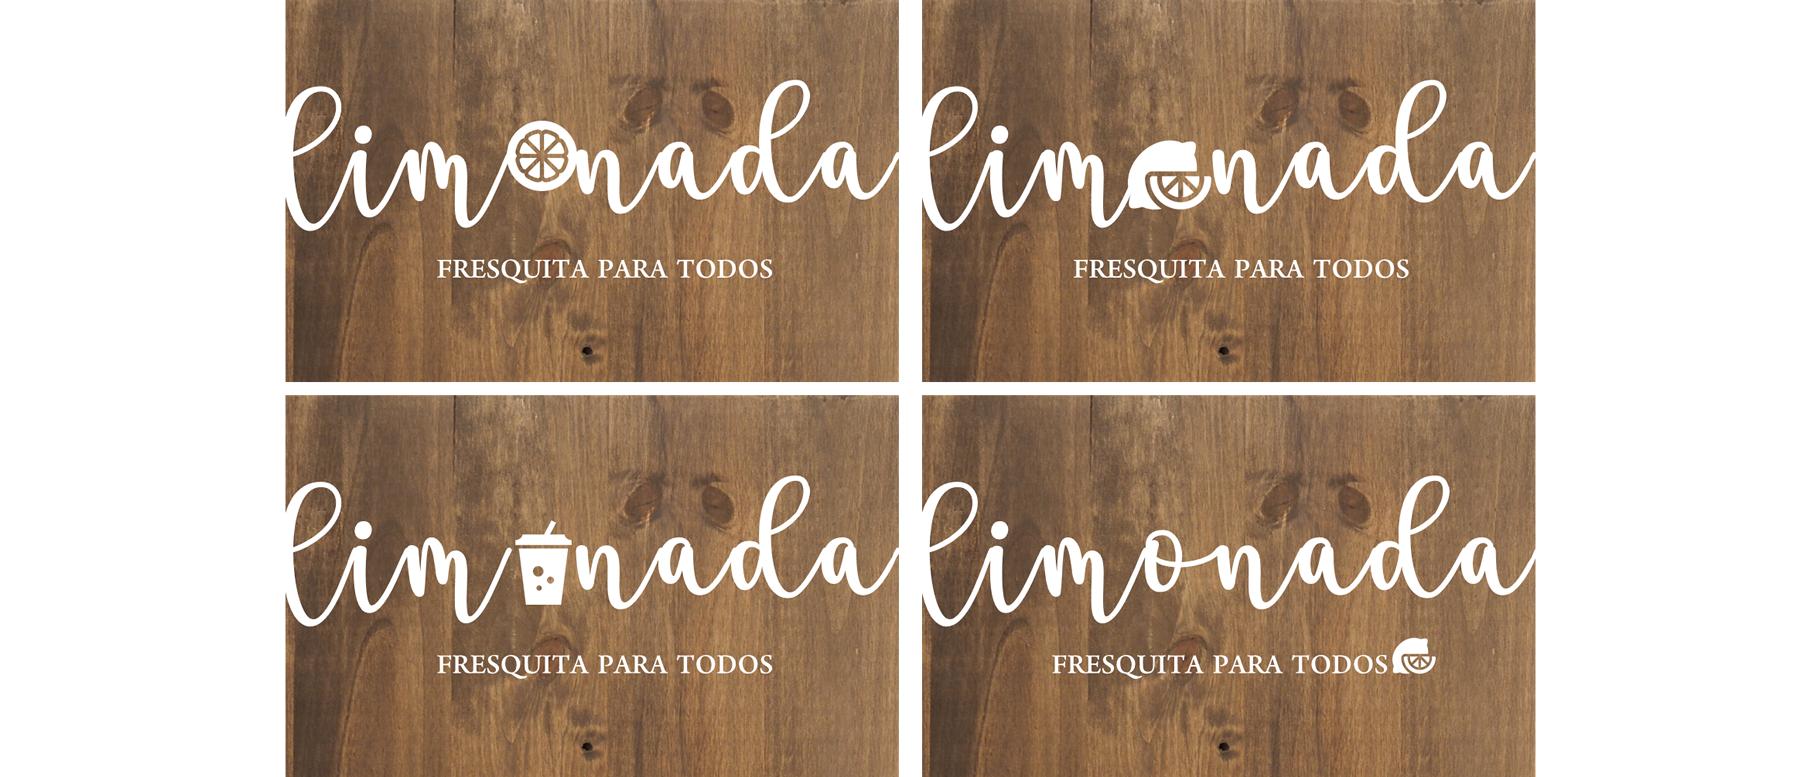 Cartel de madera Limonada Food Corners boda aperitivo eventos - BCNLETTERS